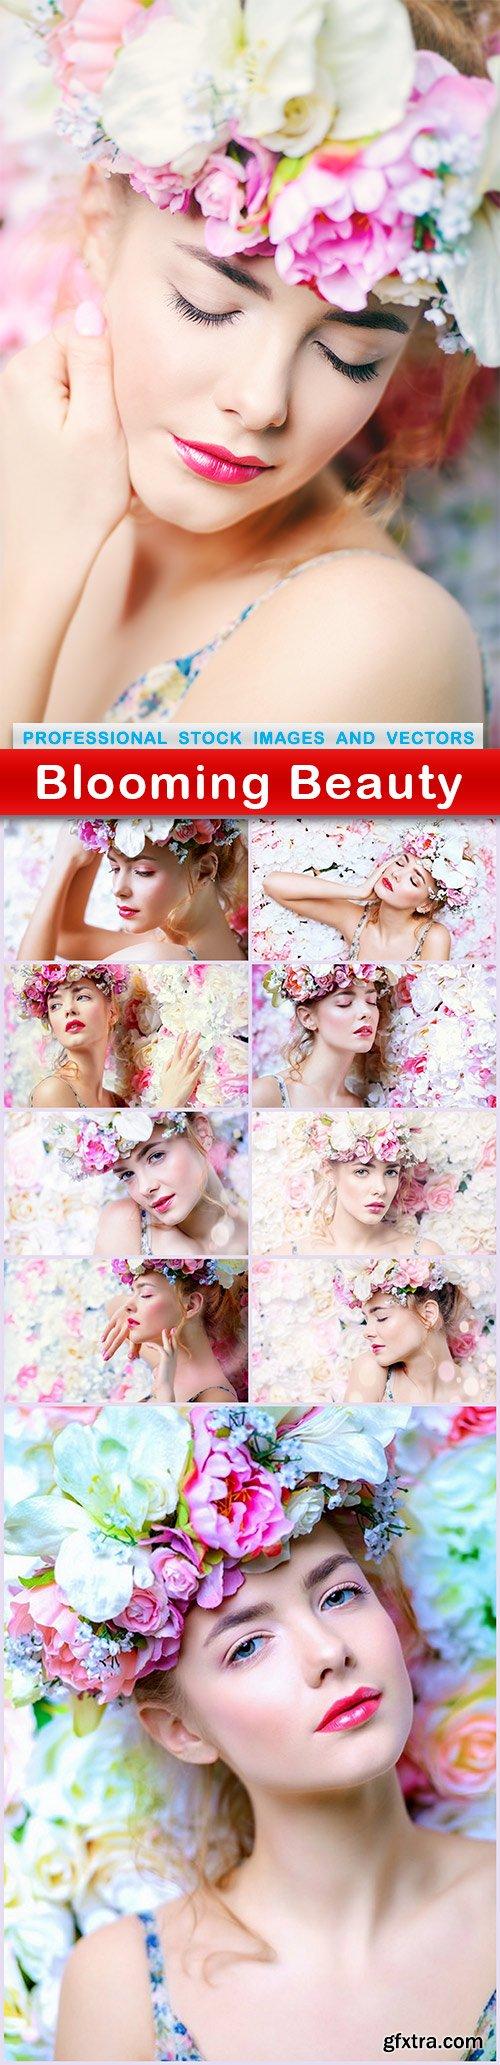 Blooming Beauty - 10 UHQ JPEG